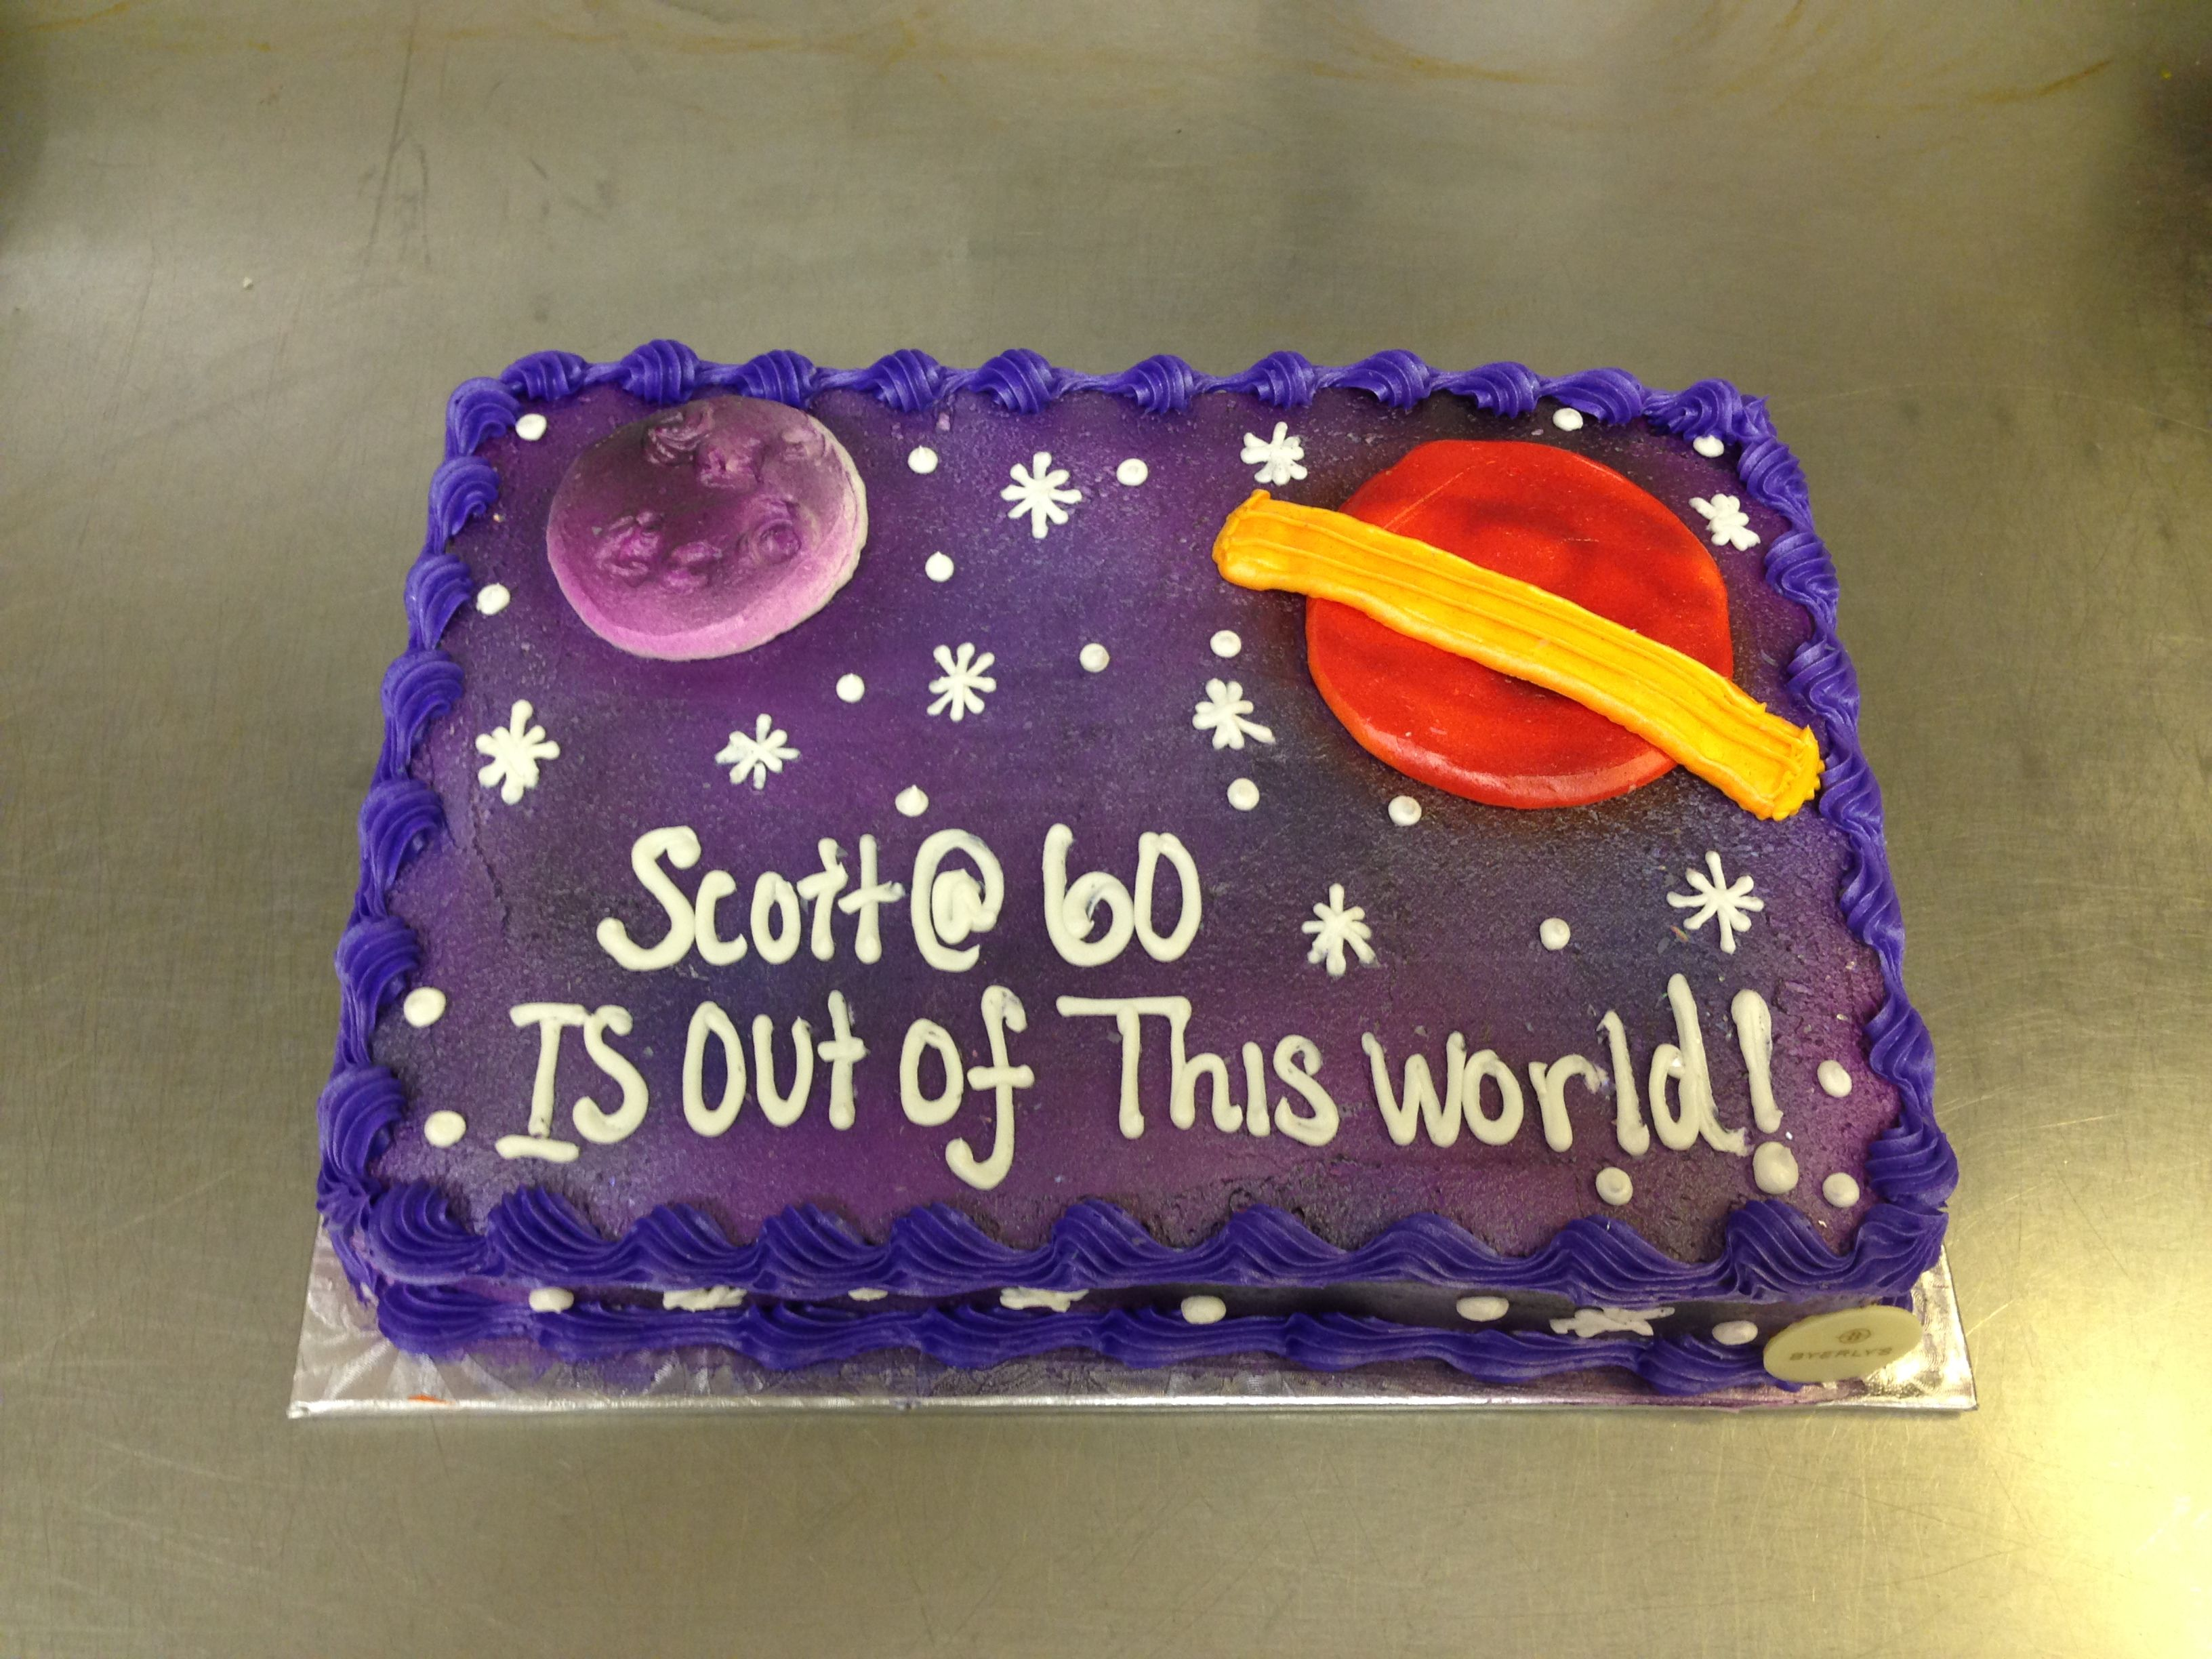 1 4 Sheet Space Theme 60th Birthday Cake Cake Drawing 60th Birthday Cakes Cake